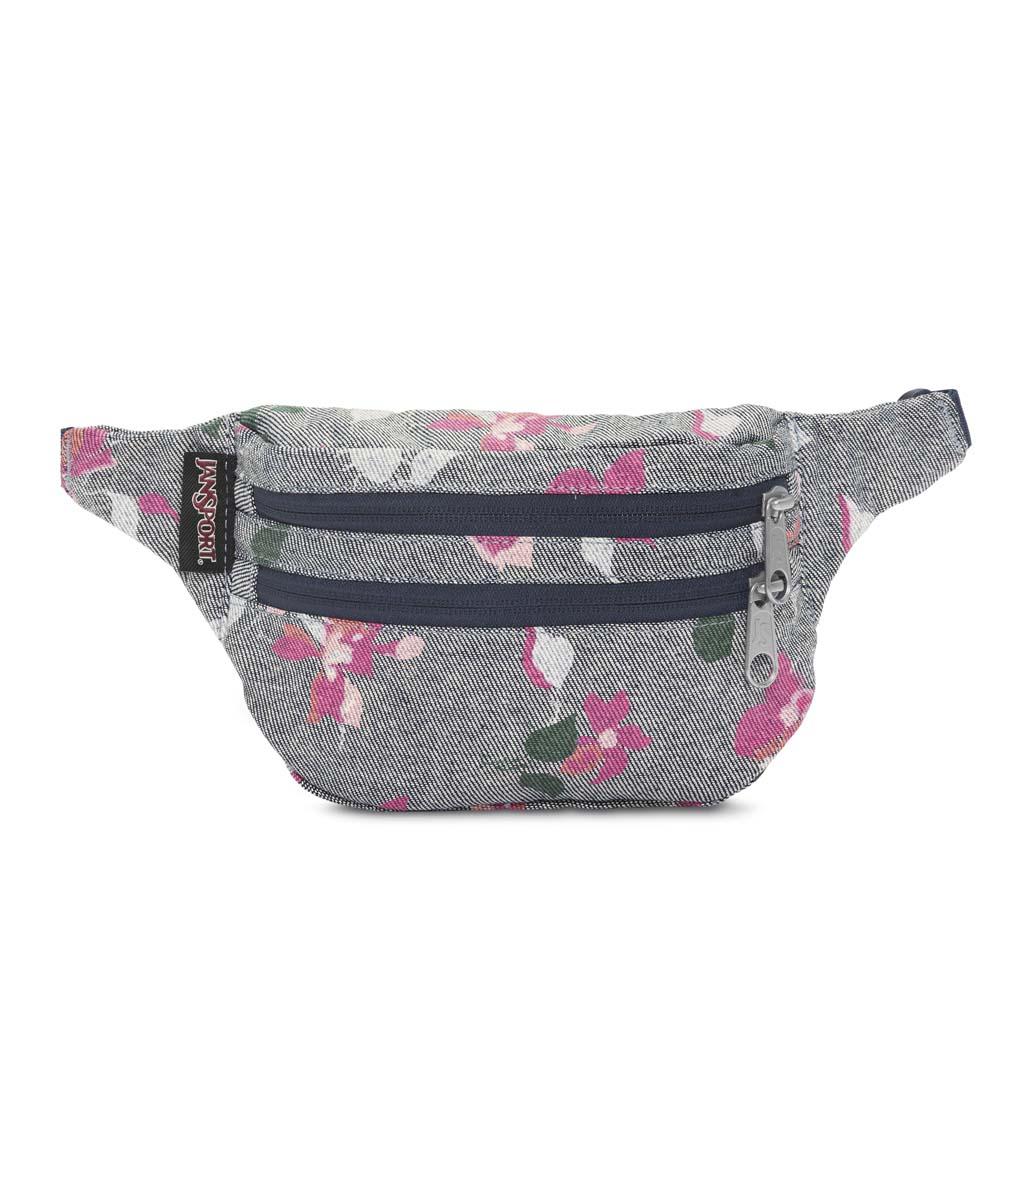 JanSport กระเป๋าเป้ รุ่น Hippyland - Chambray Sweet Blossom